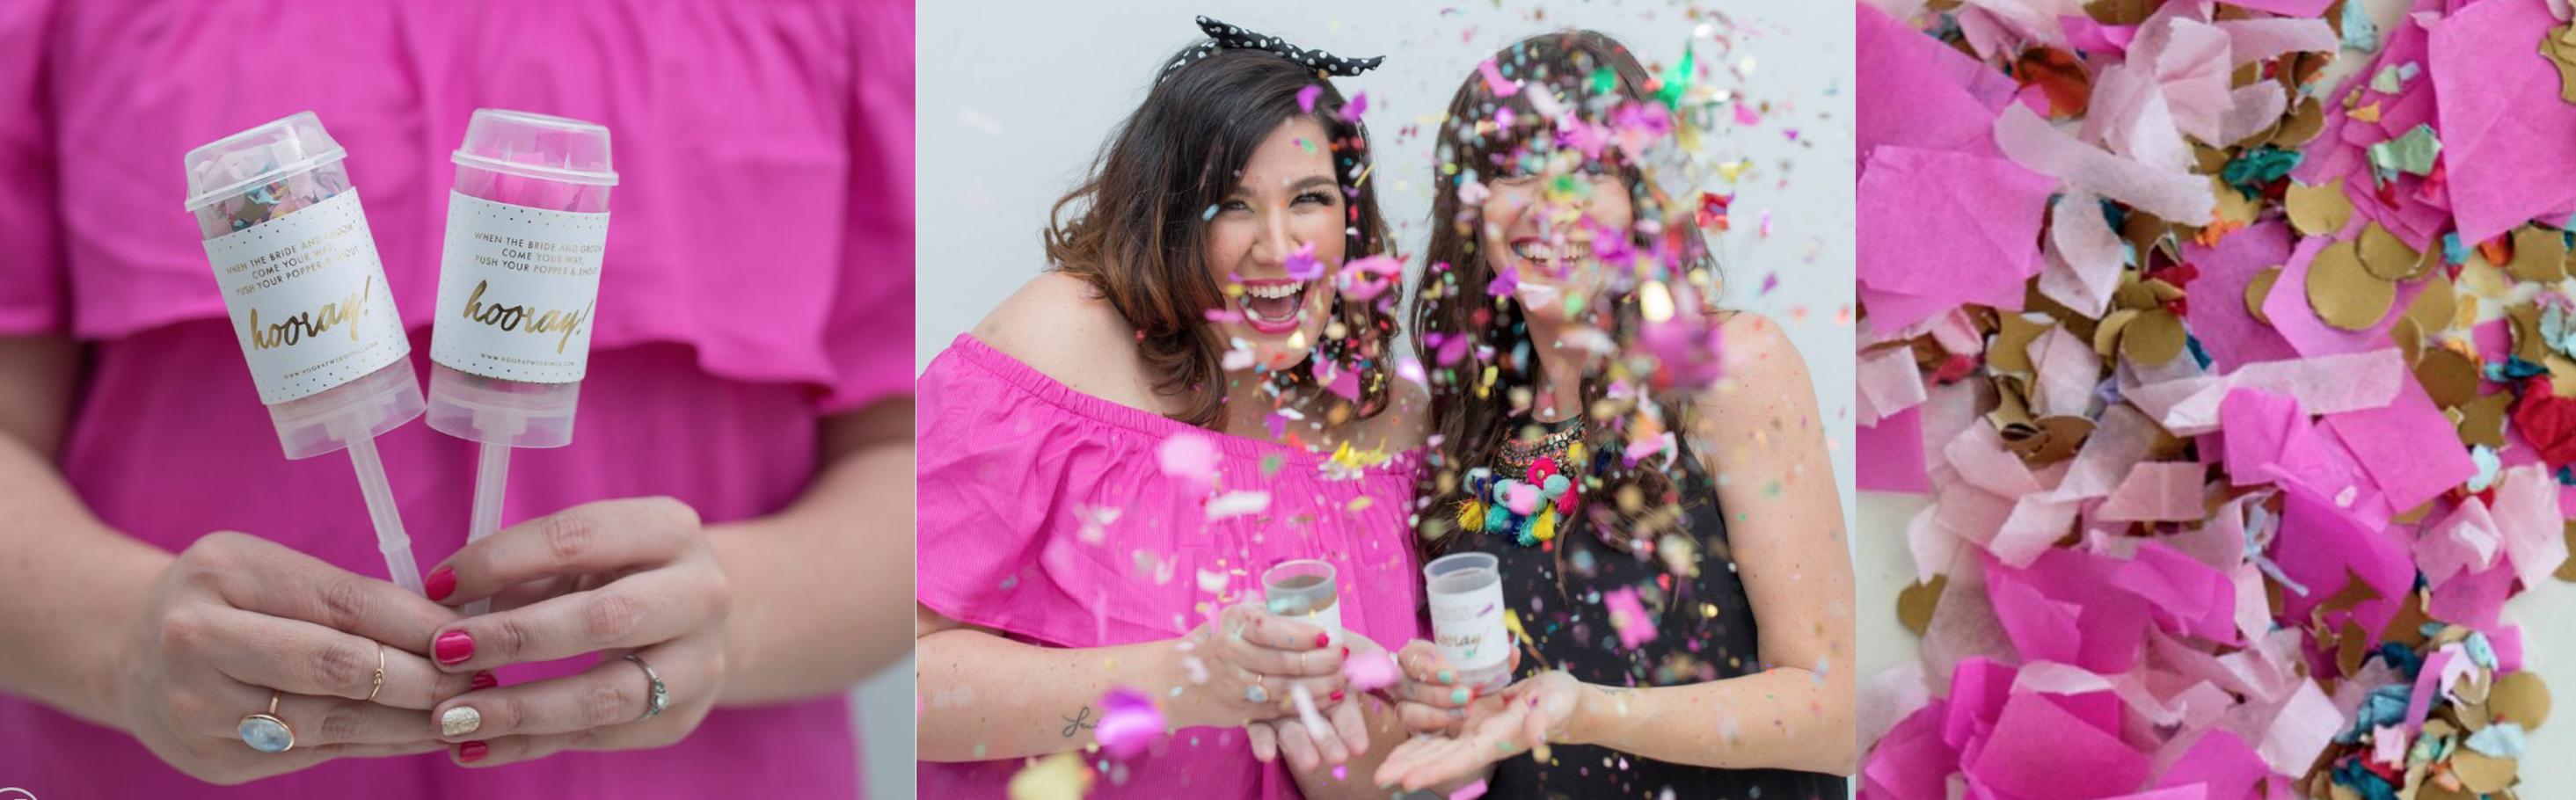 Hooray Weddings Confetti through the ages